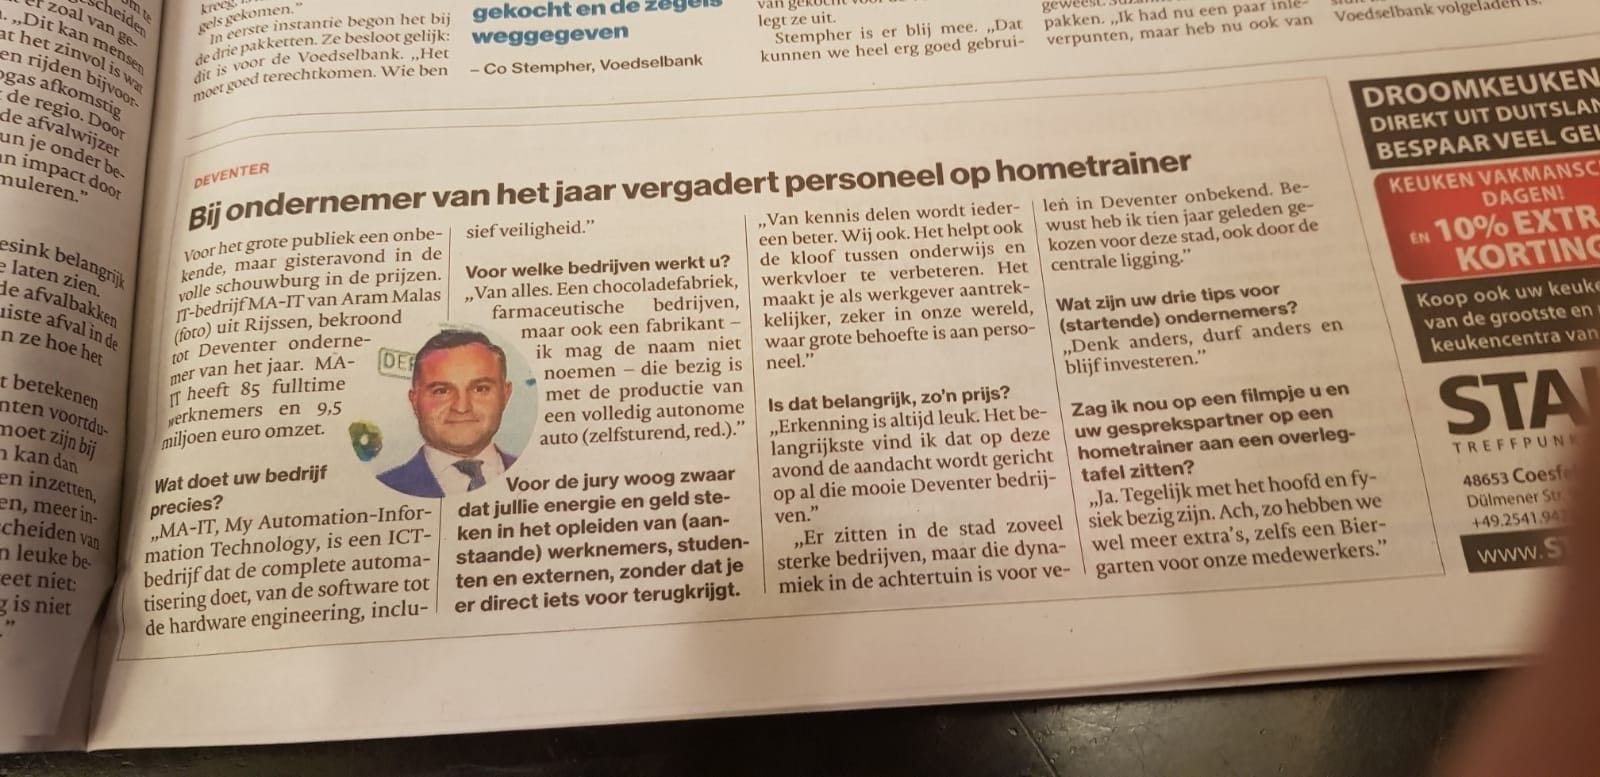 Krantenartikel in De Stentor